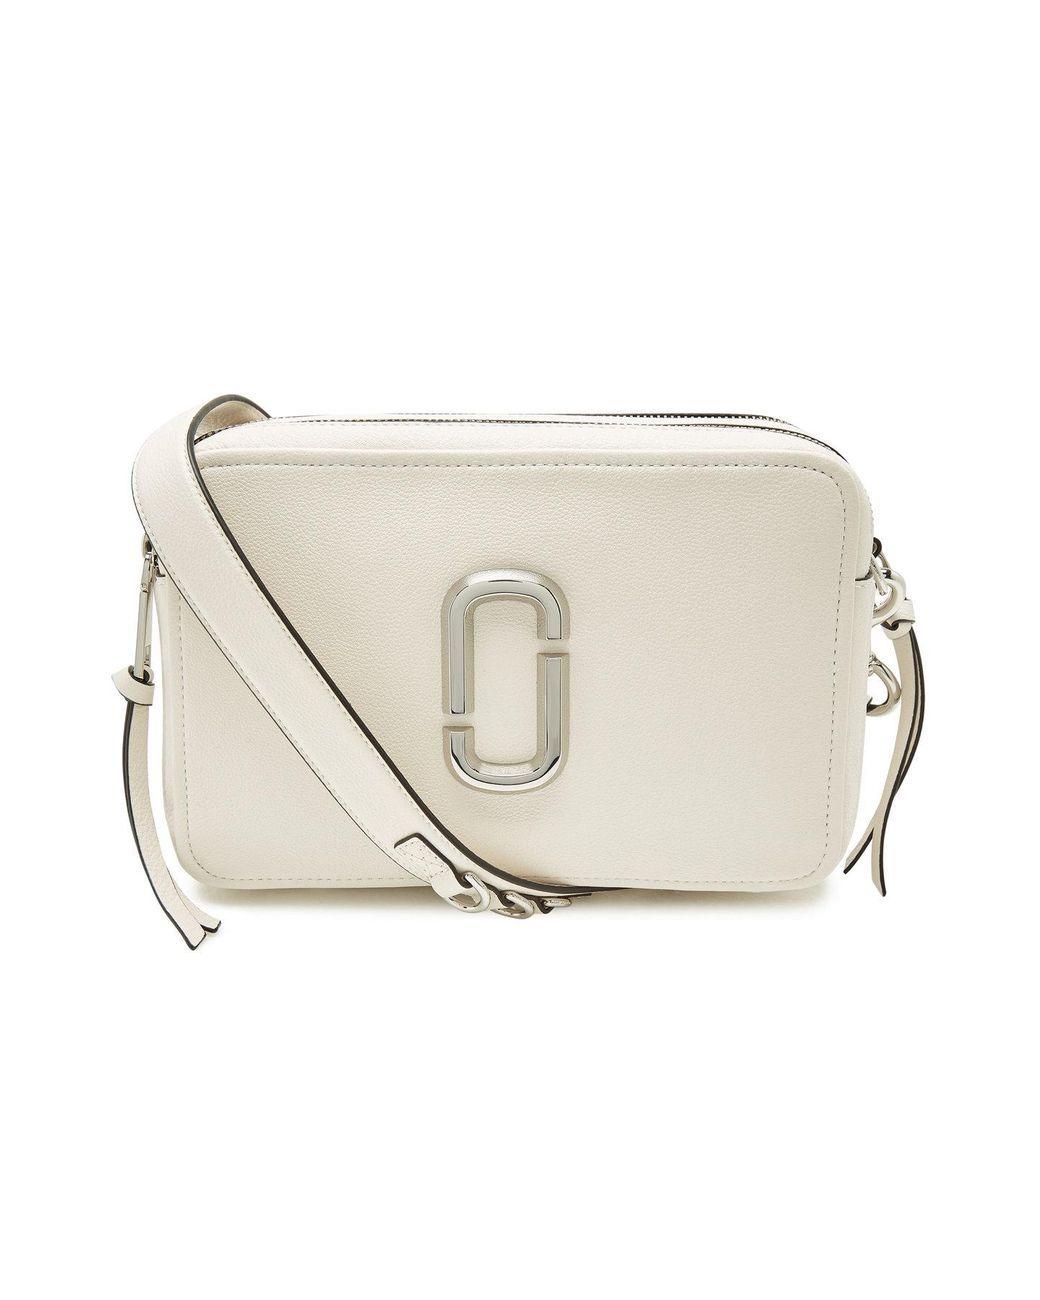 91b4eafaa315 Marc Jacobs - Multicolor The Softshot 27 Leather Crossbody Bag - Lyst